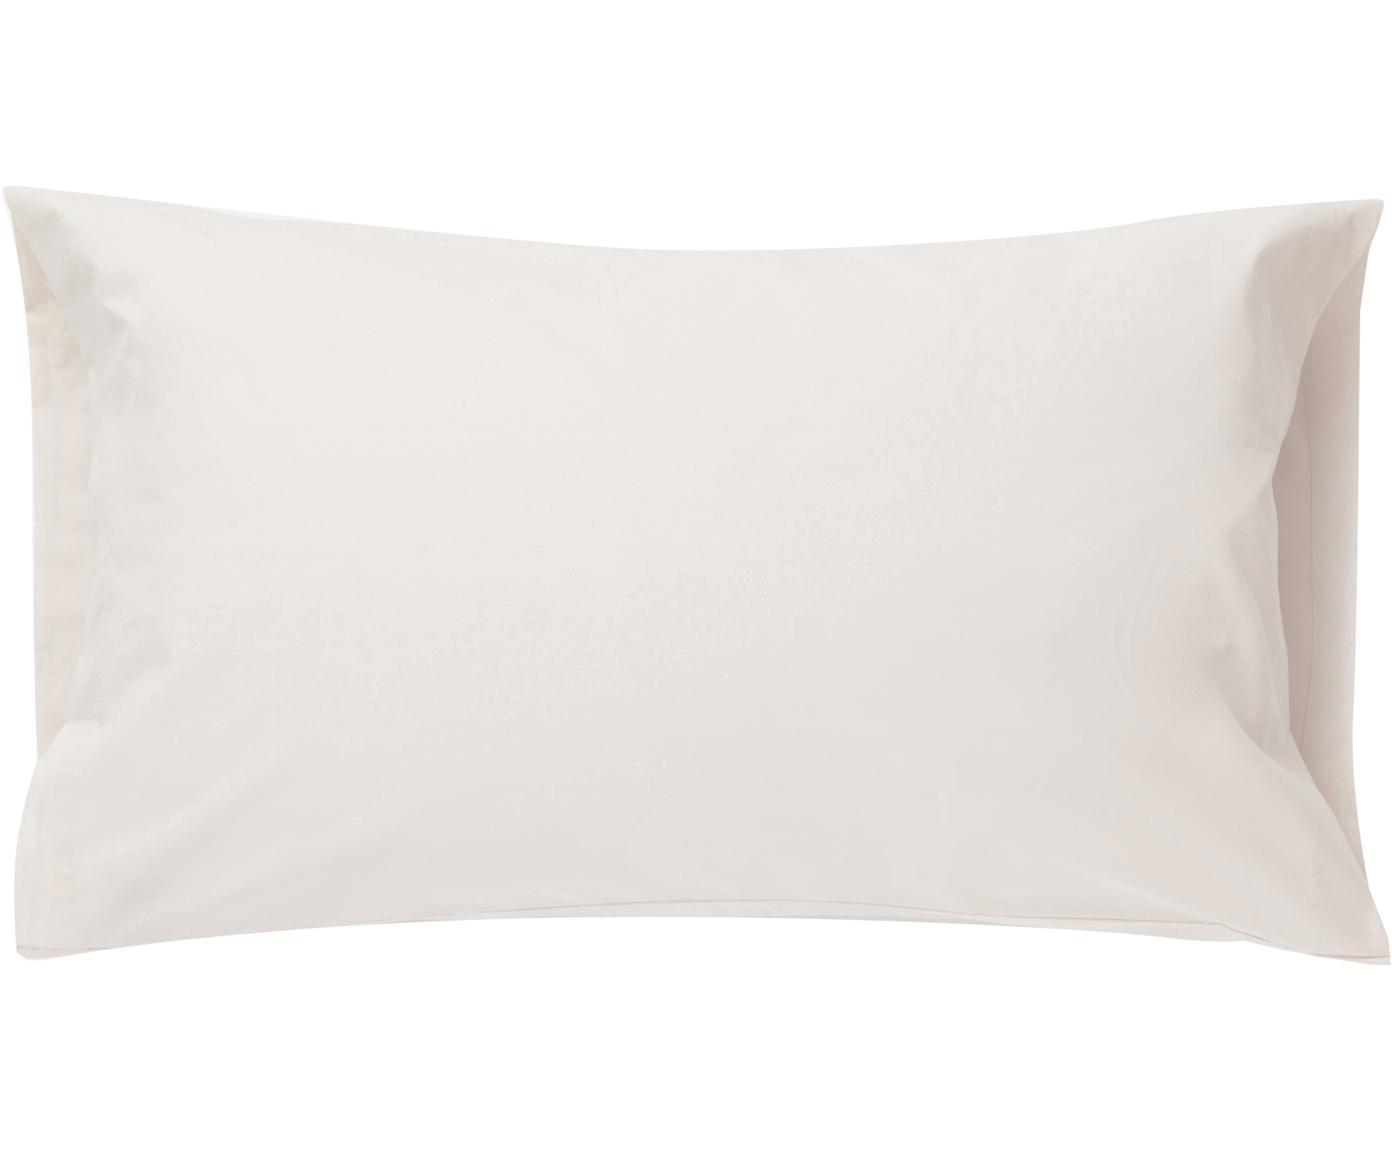 Fundas de almohada Plain Dye, 2uds., Algodón, Crema, An 50 x L 85 cm